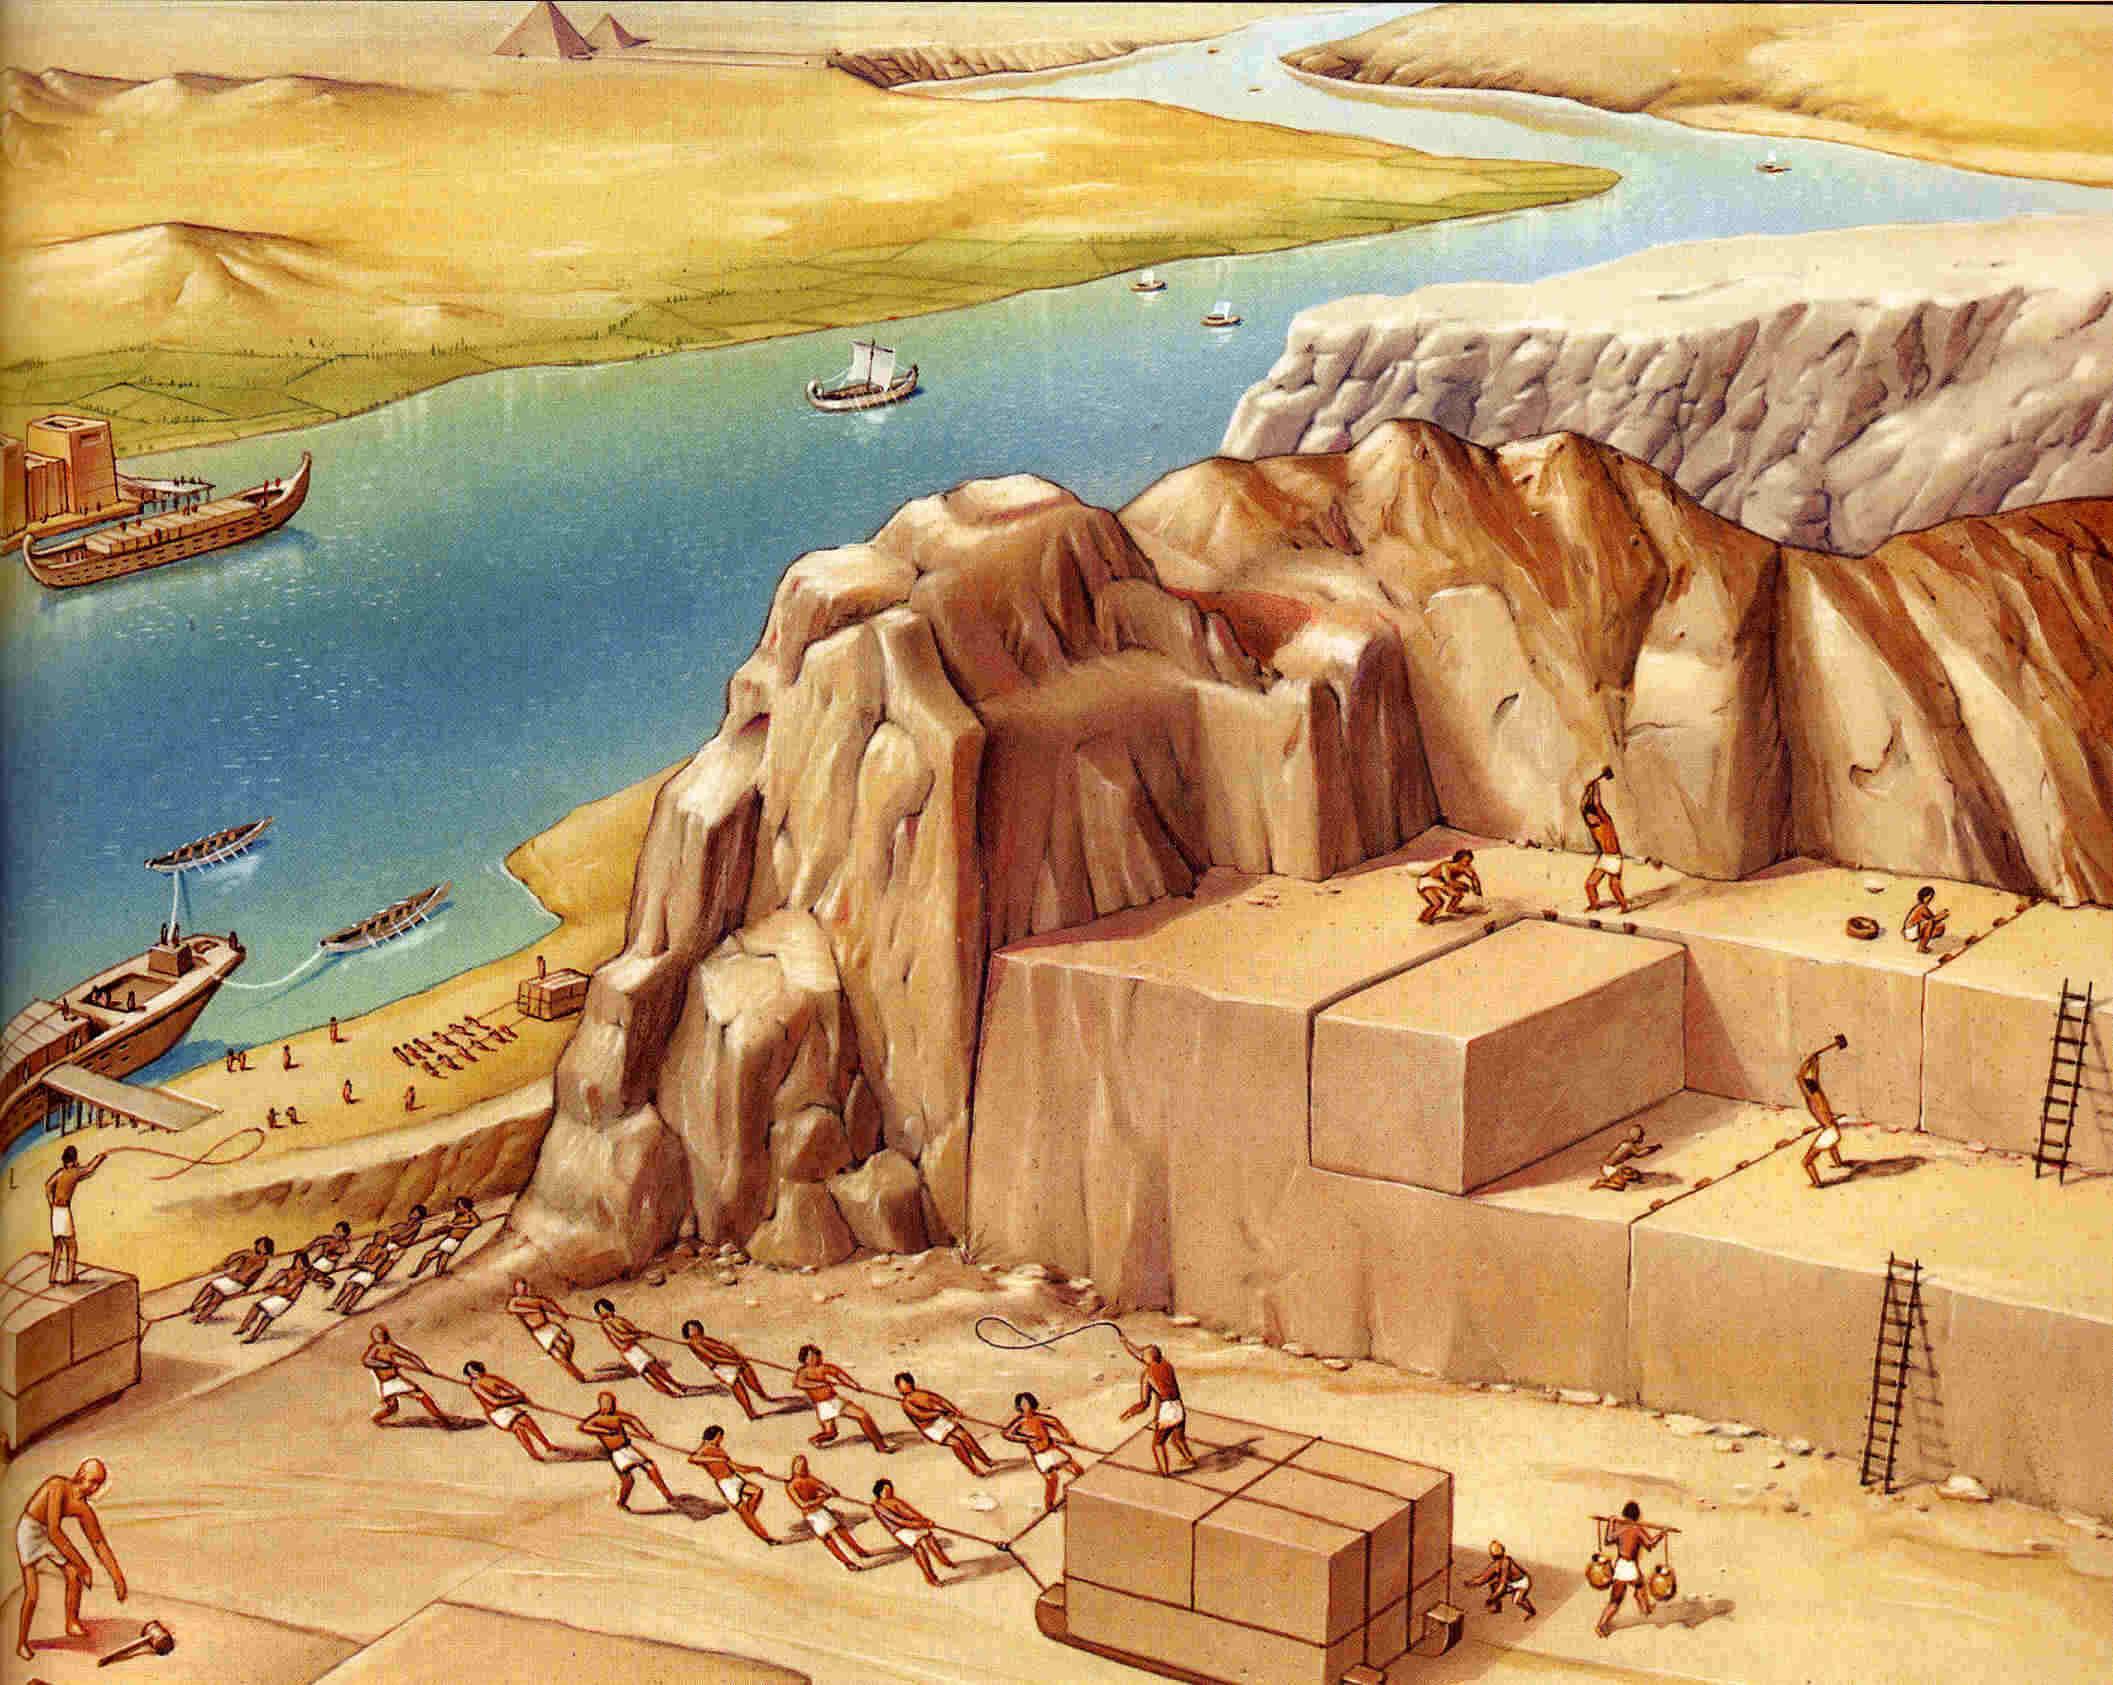 Abydos c